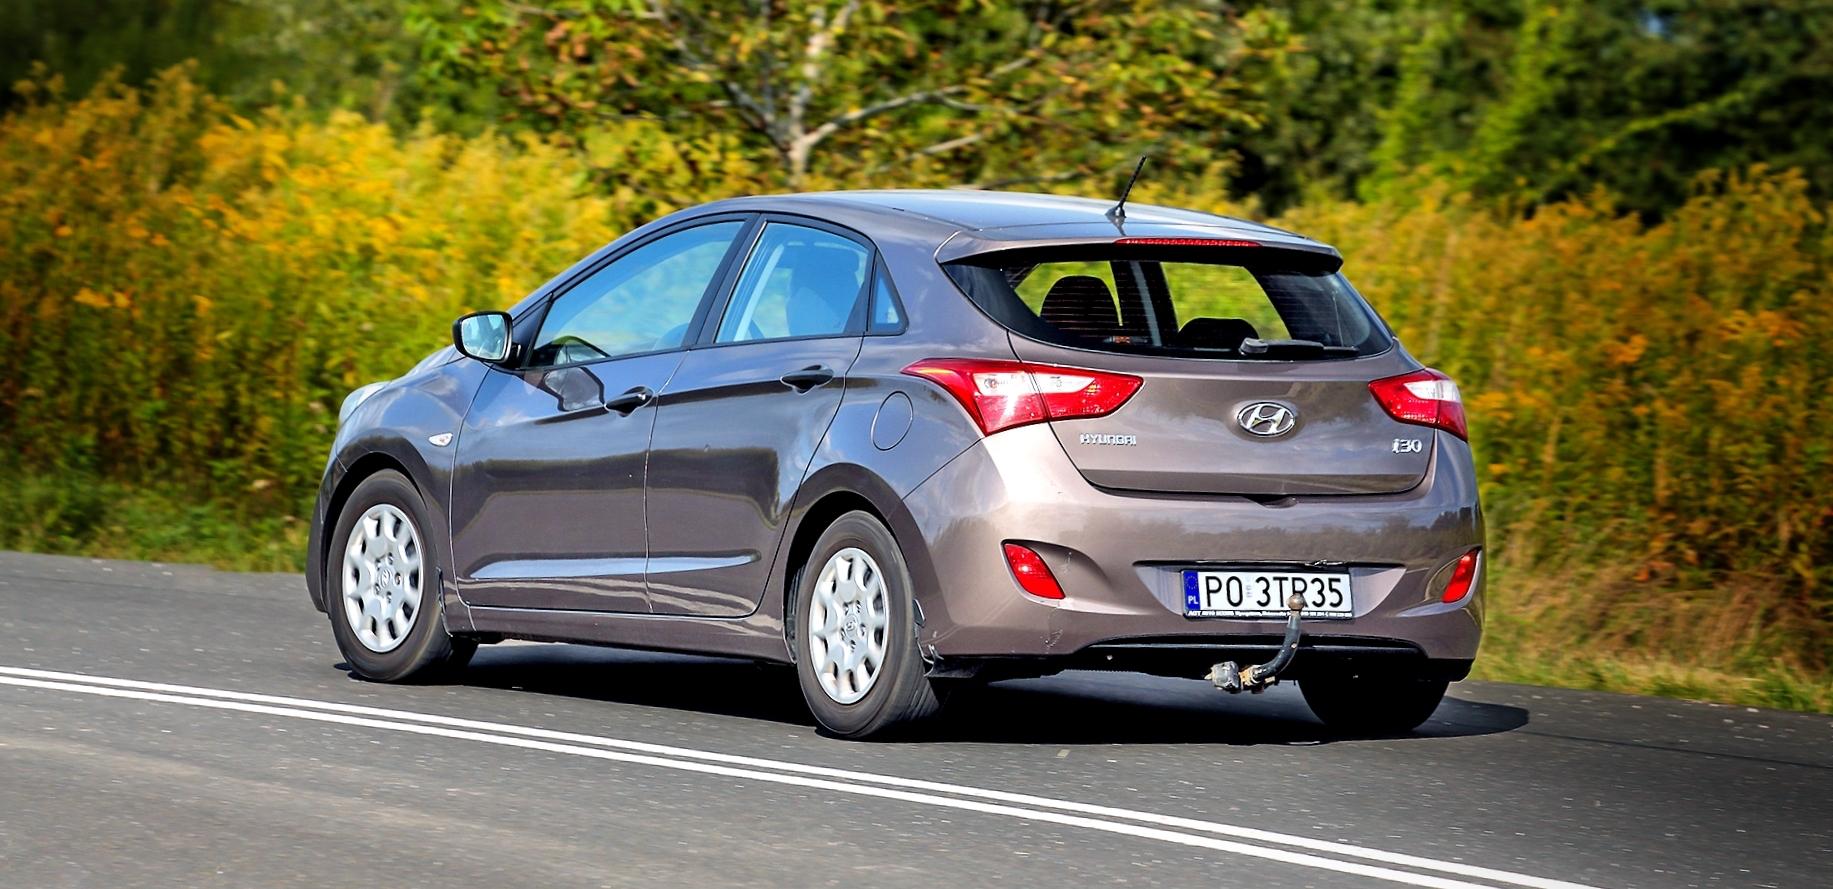 Hyundai i30 II 1.4 CRDi wruchu bok itył